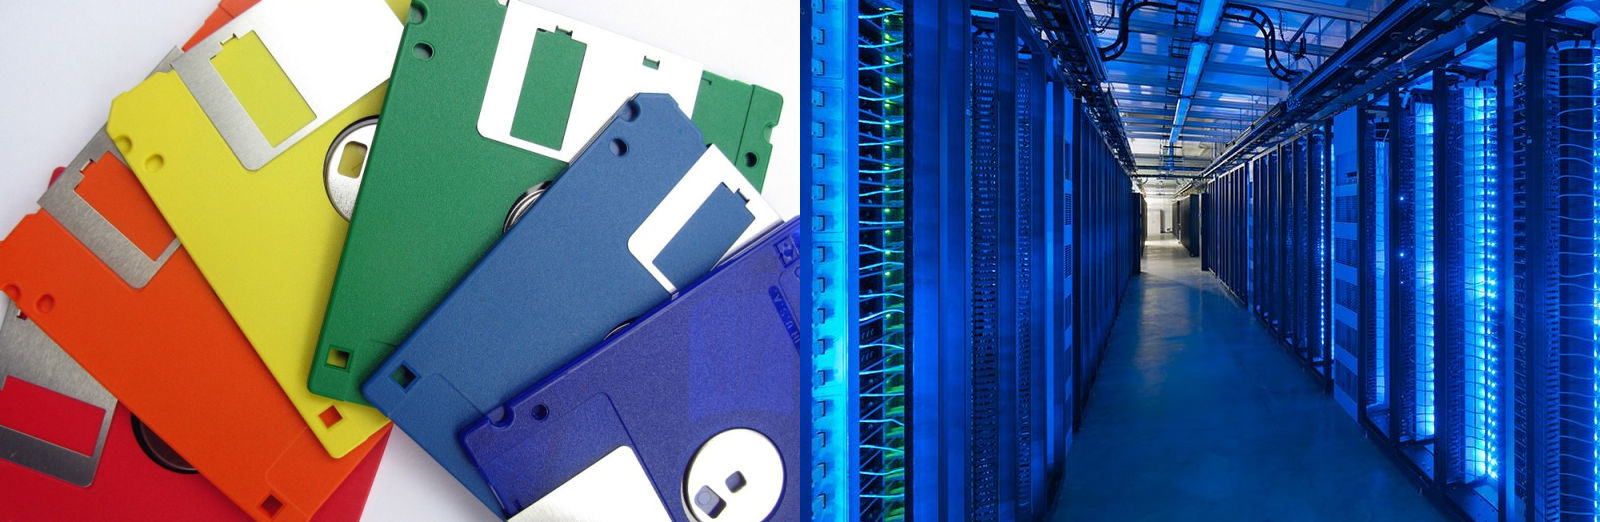 floppy disk and datacenter